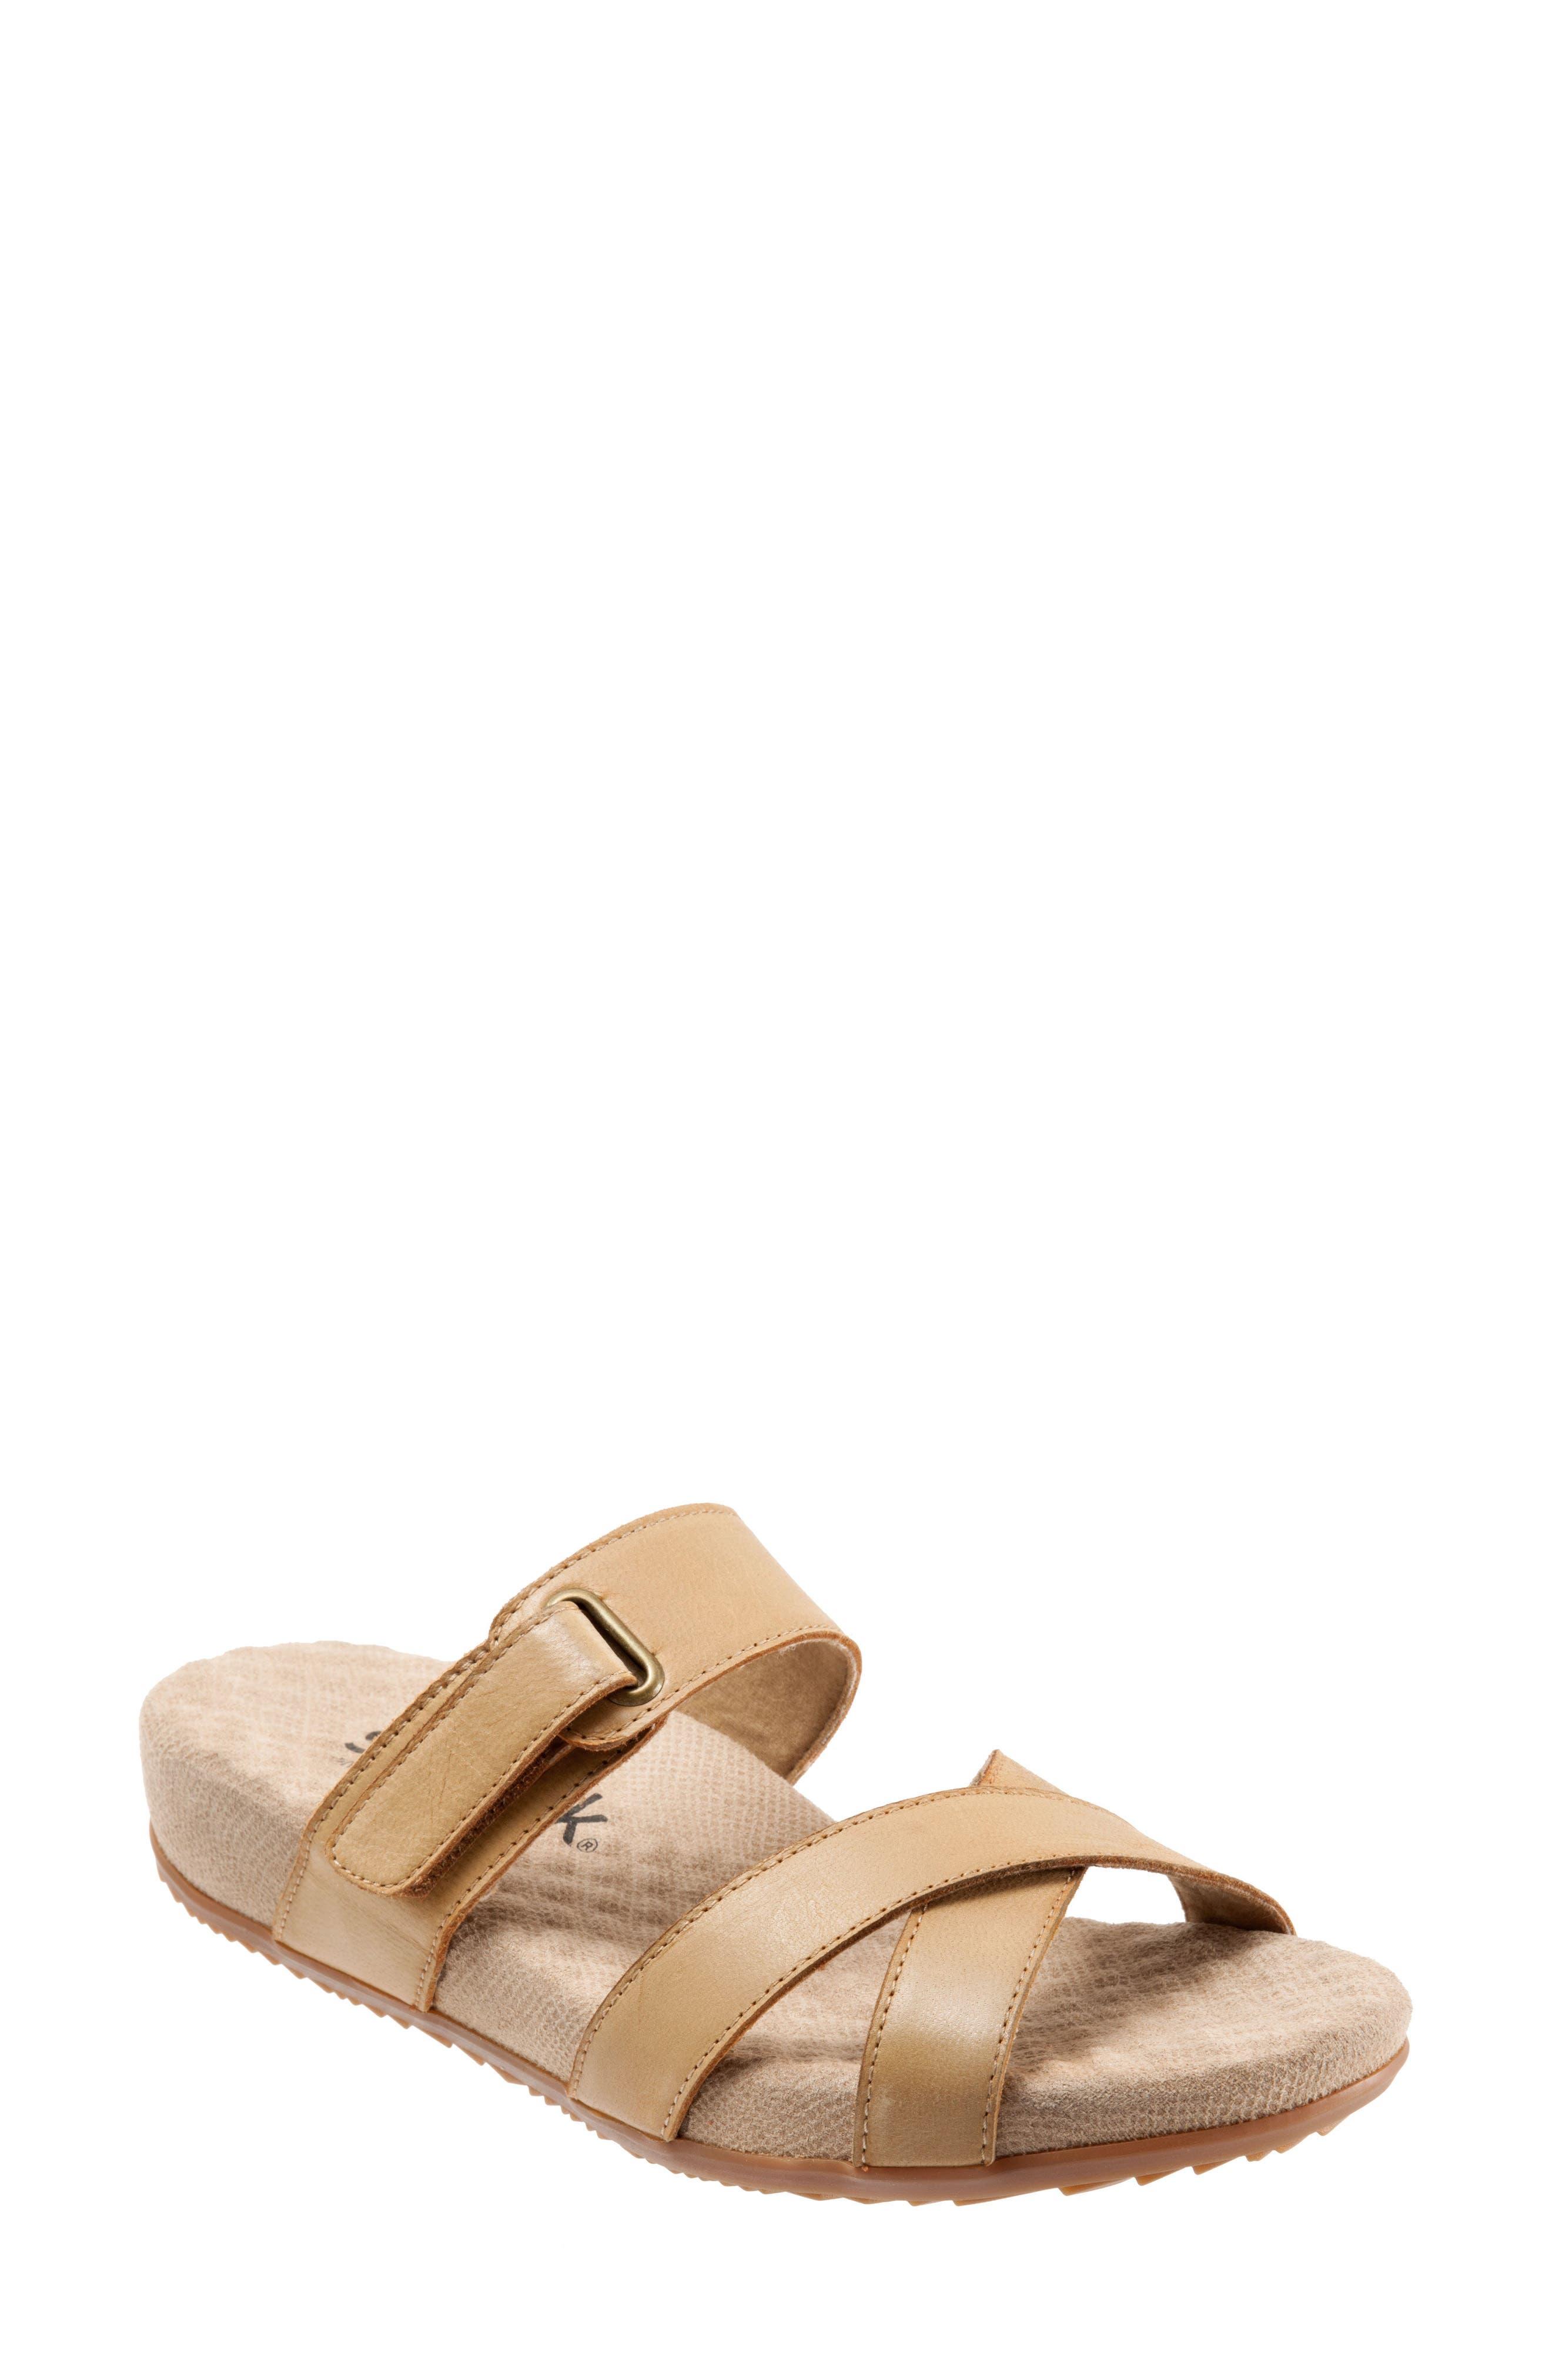 Softwalk Brimley Sandal, Brown